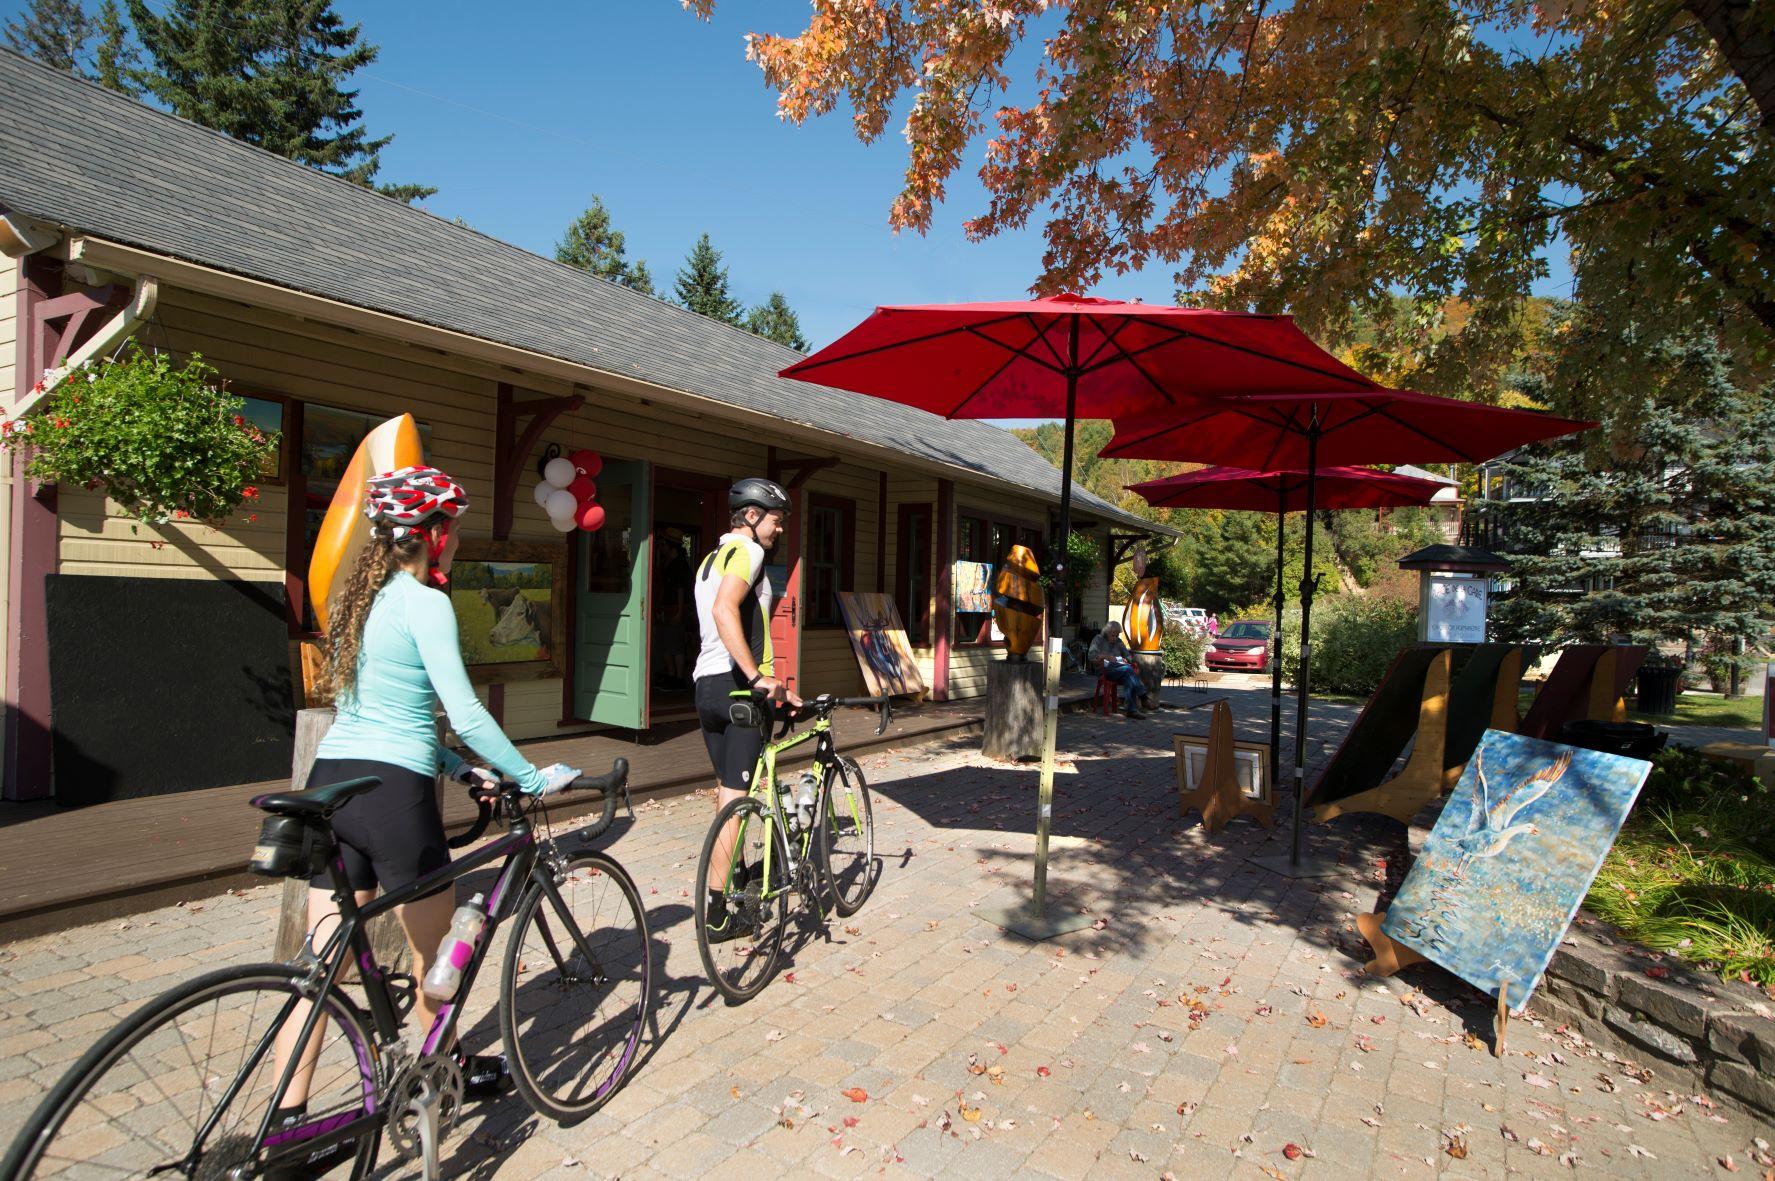 cyclists walk bikes by a train station